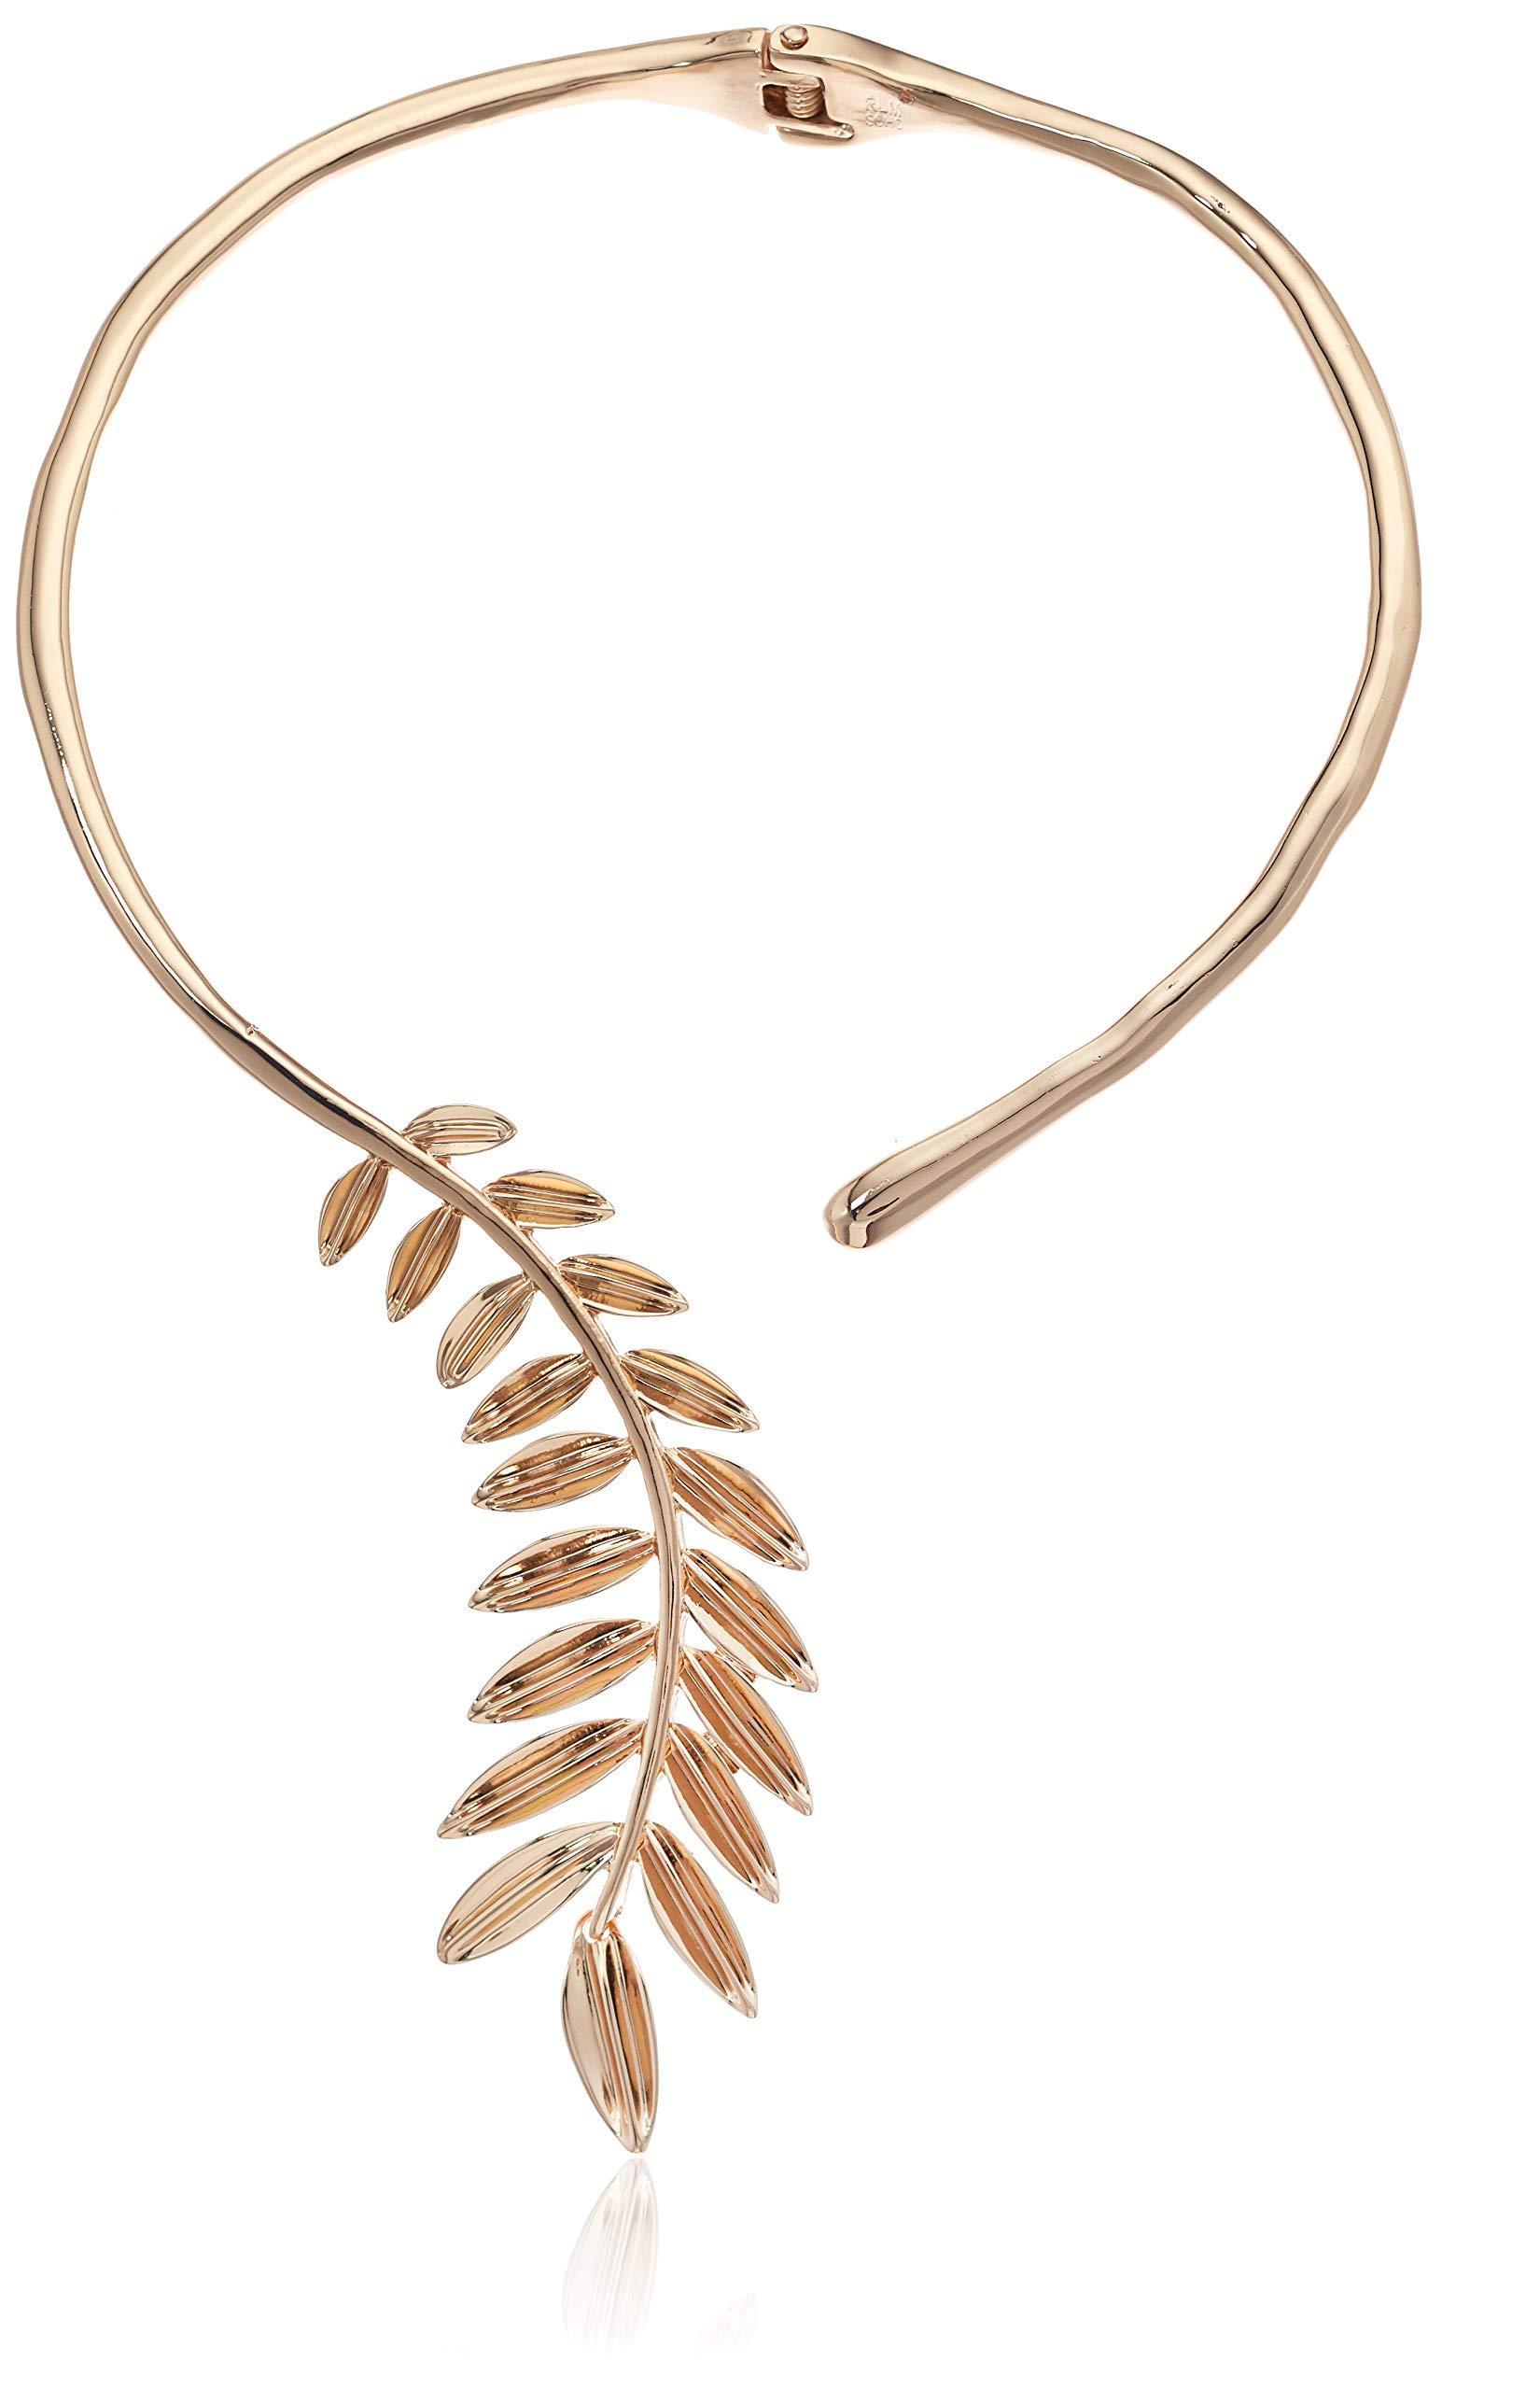 Robert Lee Morris Soho Women's Sculptural Leaf Hinged Collar Necklace, Gold , One Size by Robert Lee Morris Soho